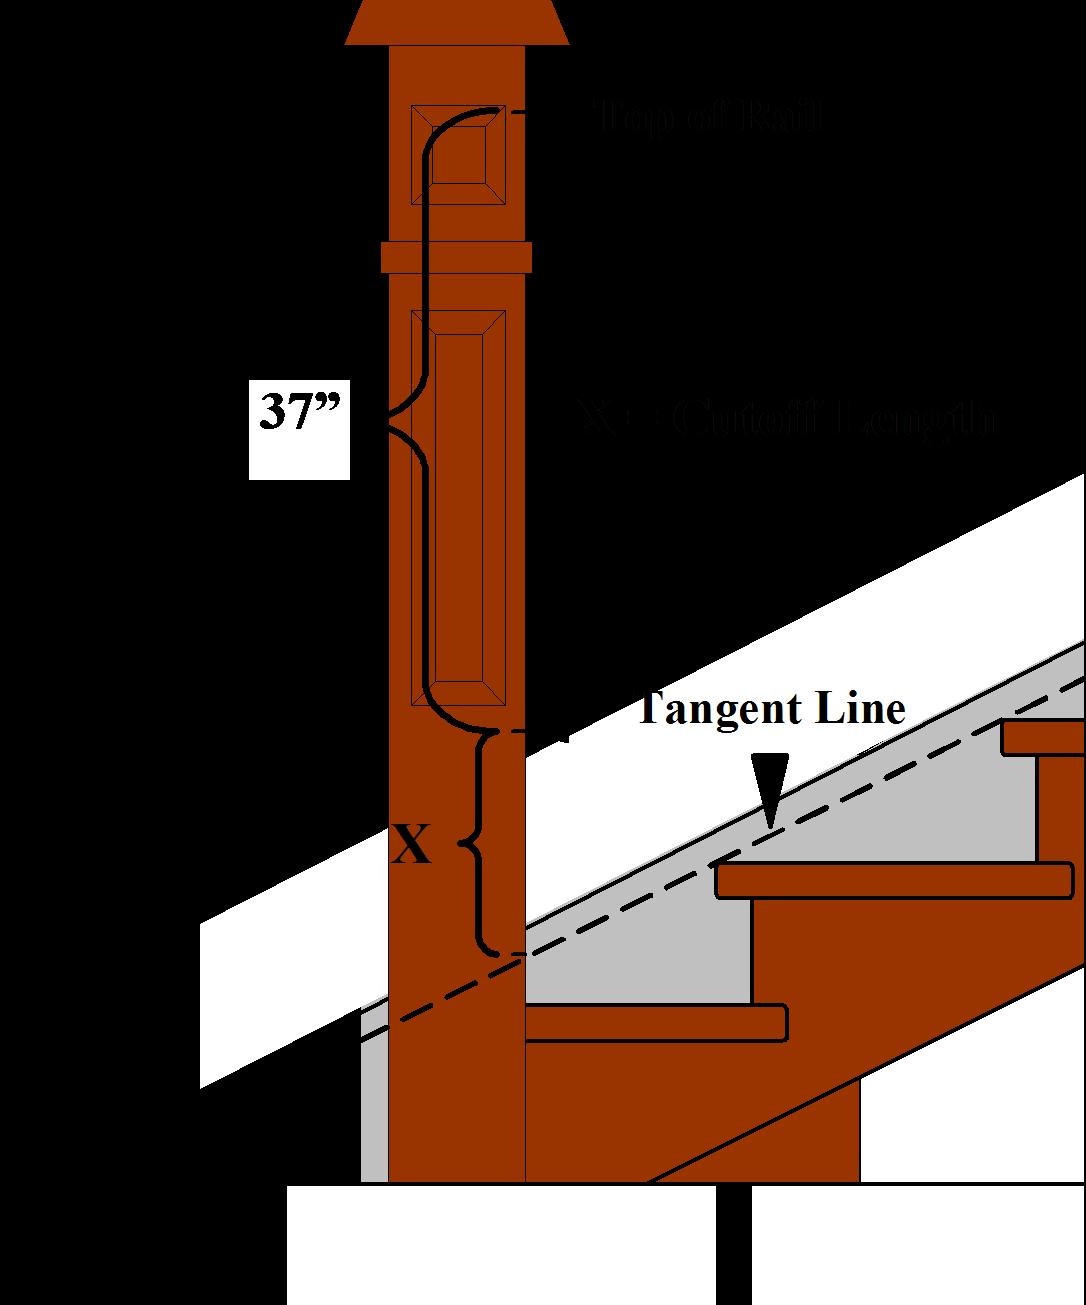 Newel Post Height Calculating Handrail Newel Post Height   Attaching Handrail To Newel Post   Bolt   Fine Homebuilding   Stair Treads   Wood   Baluster